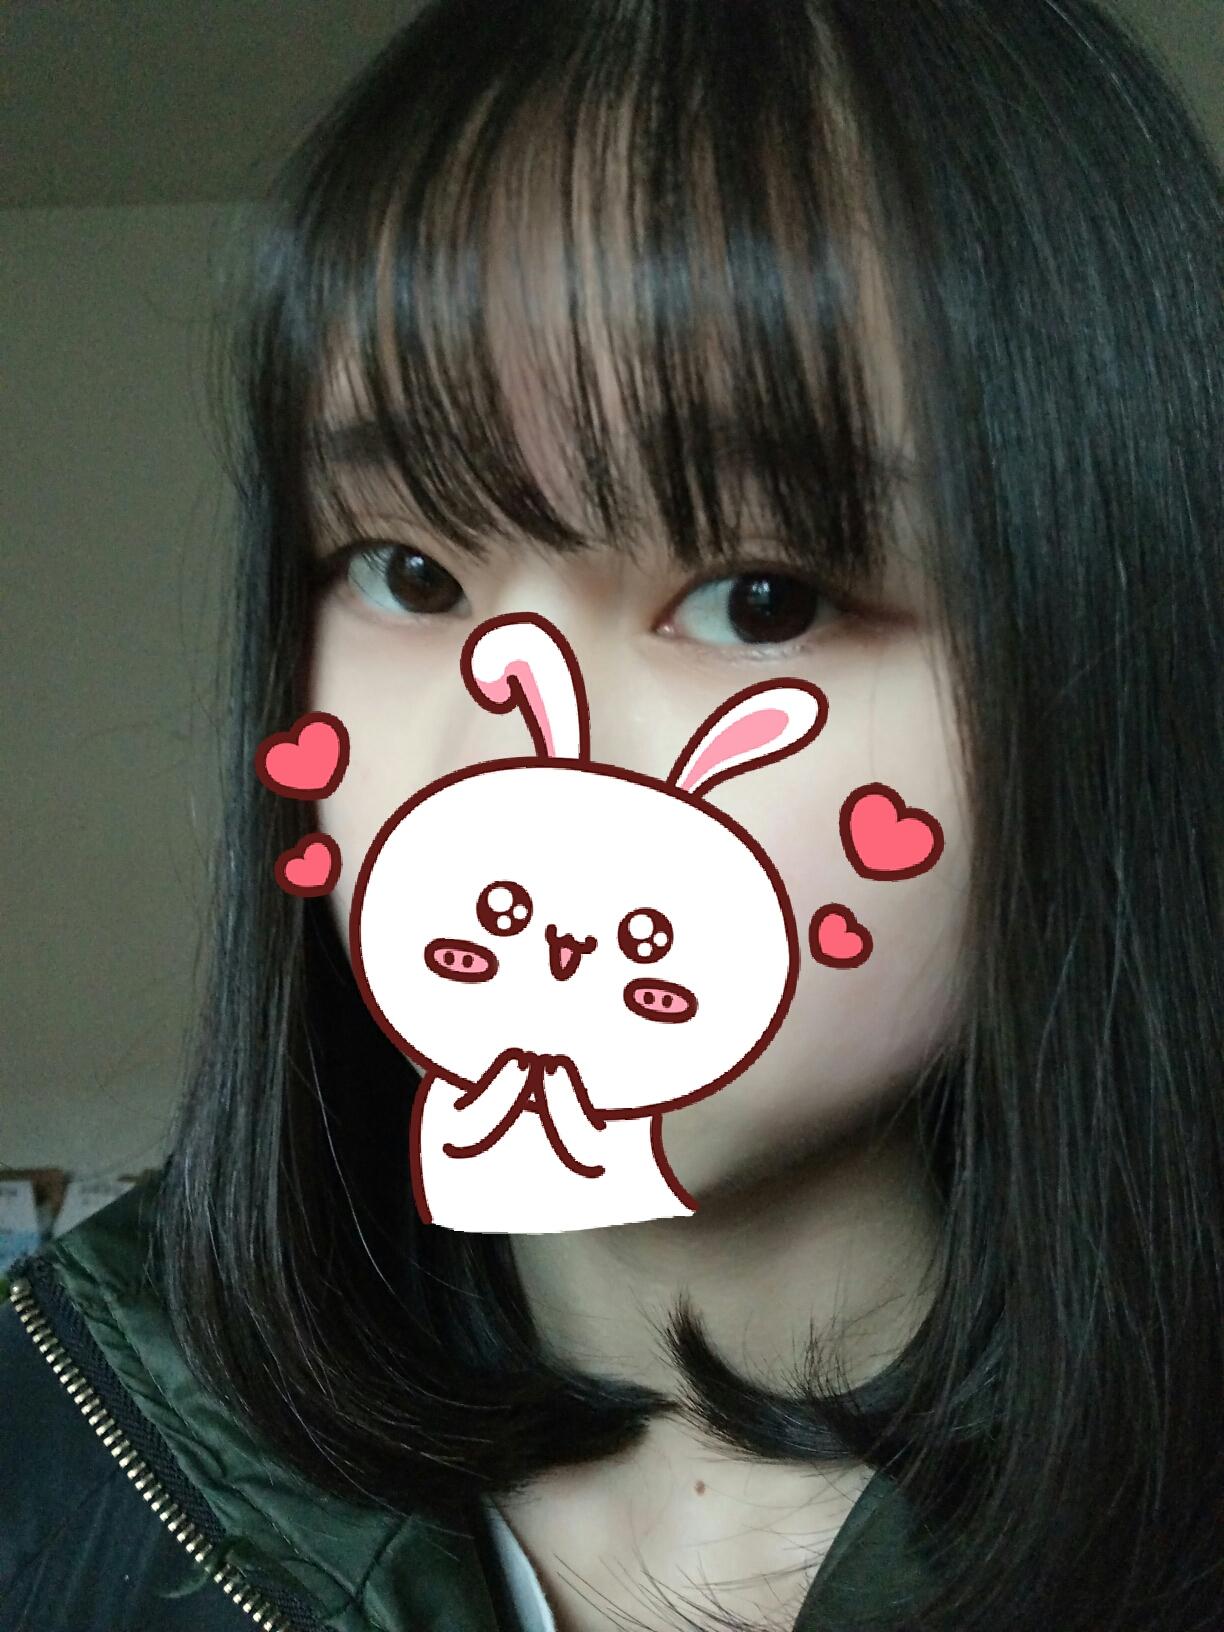 1484815895494_832b3c8d-0ab1-4d9f-9b88-72c81f41f38a_by_weibo_editor.jpg